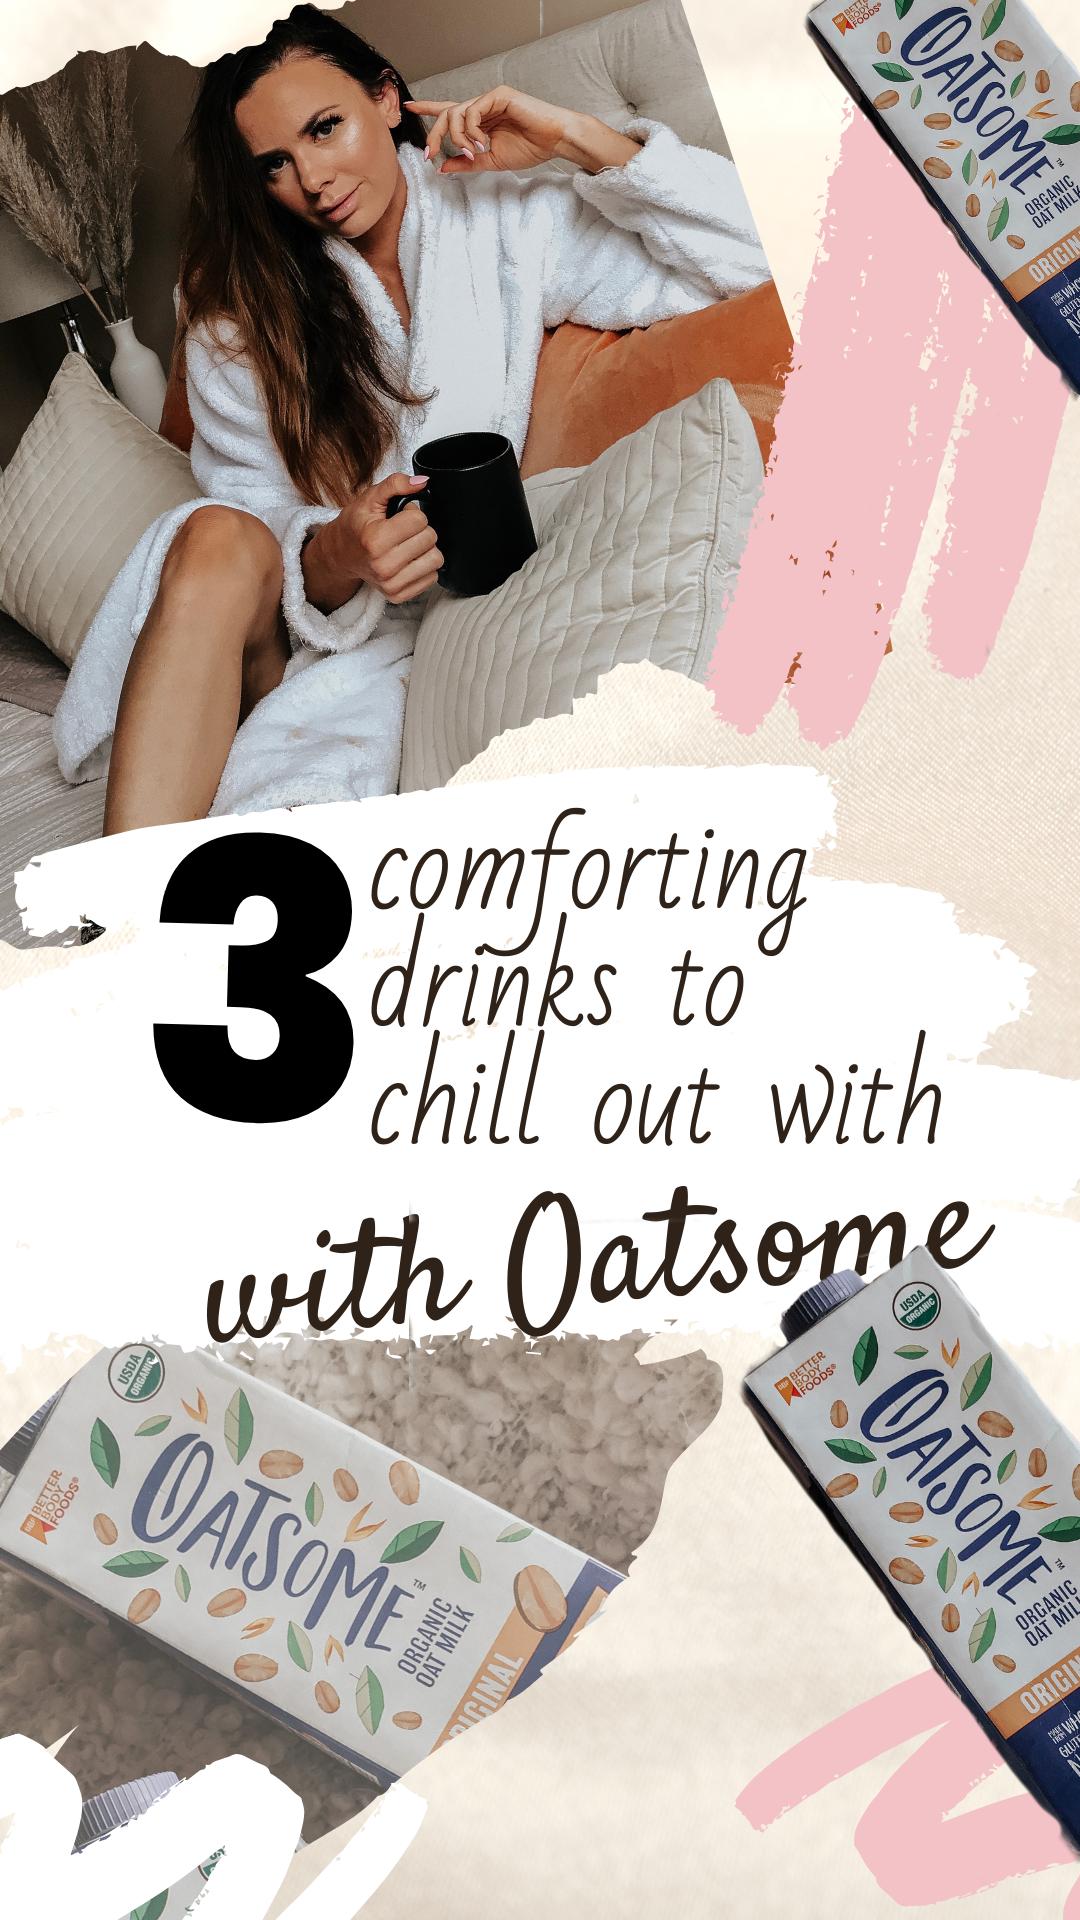 Oatsome2